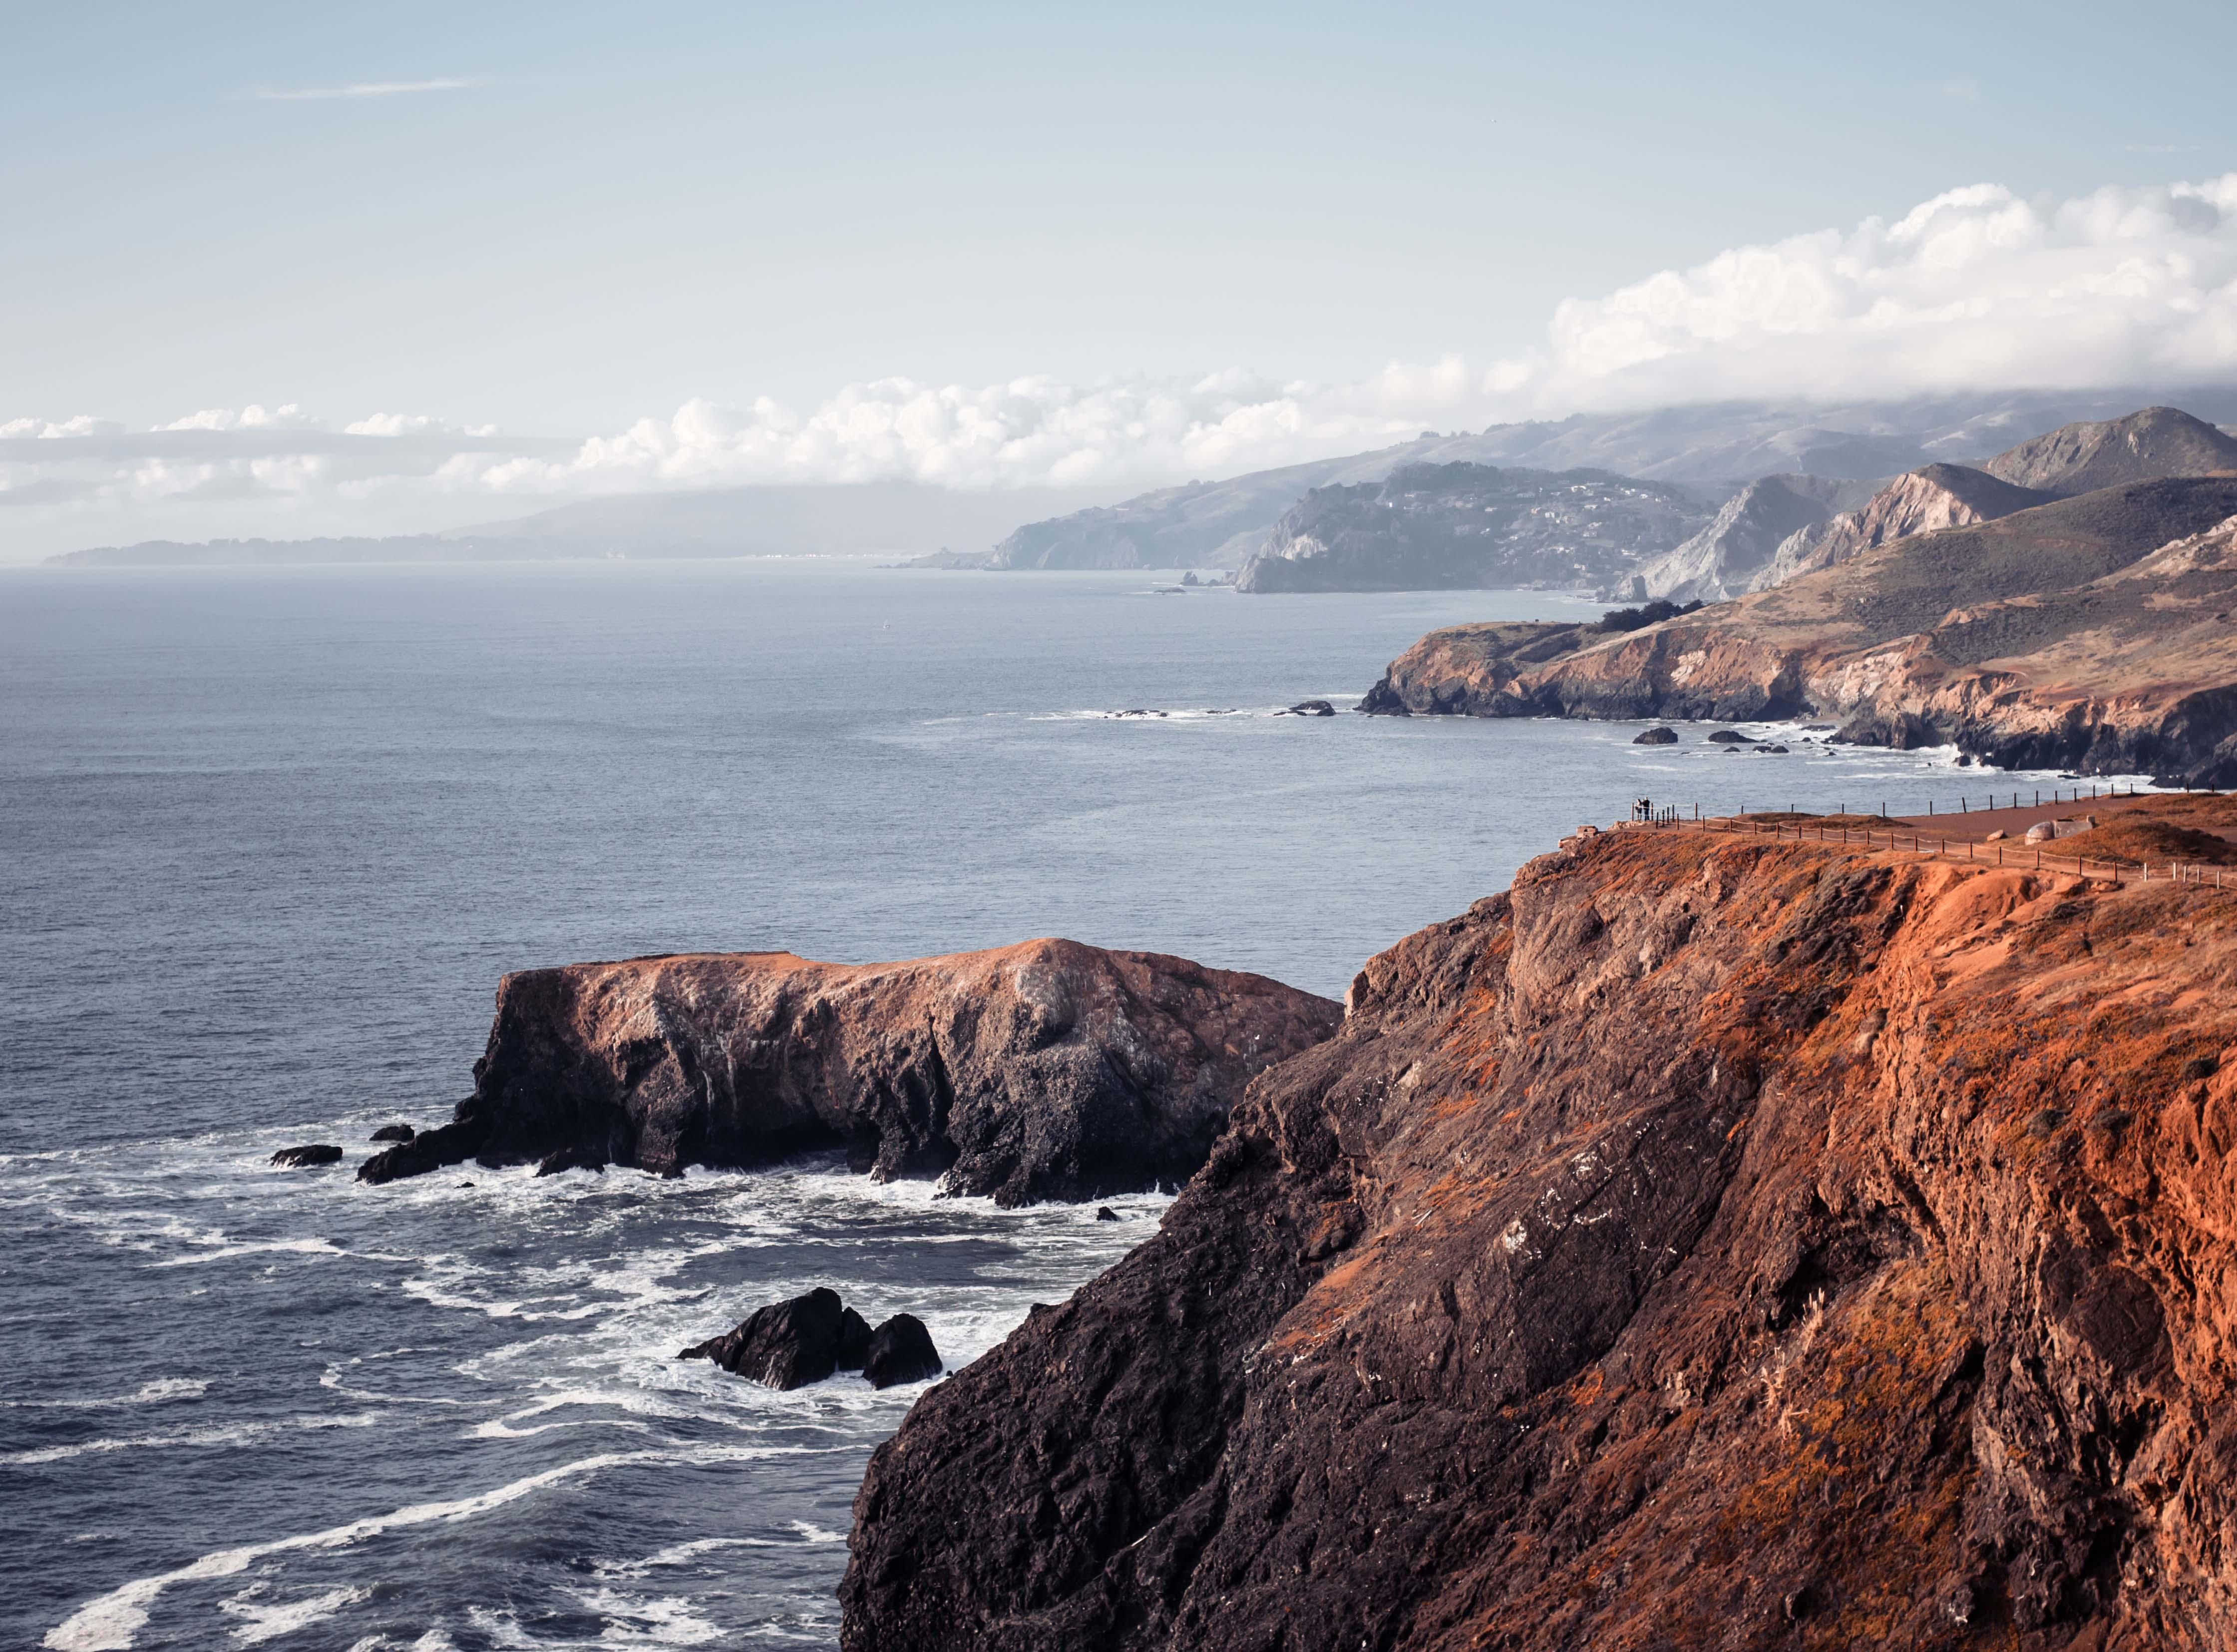 Crimson cliffs against turbulent ocean.